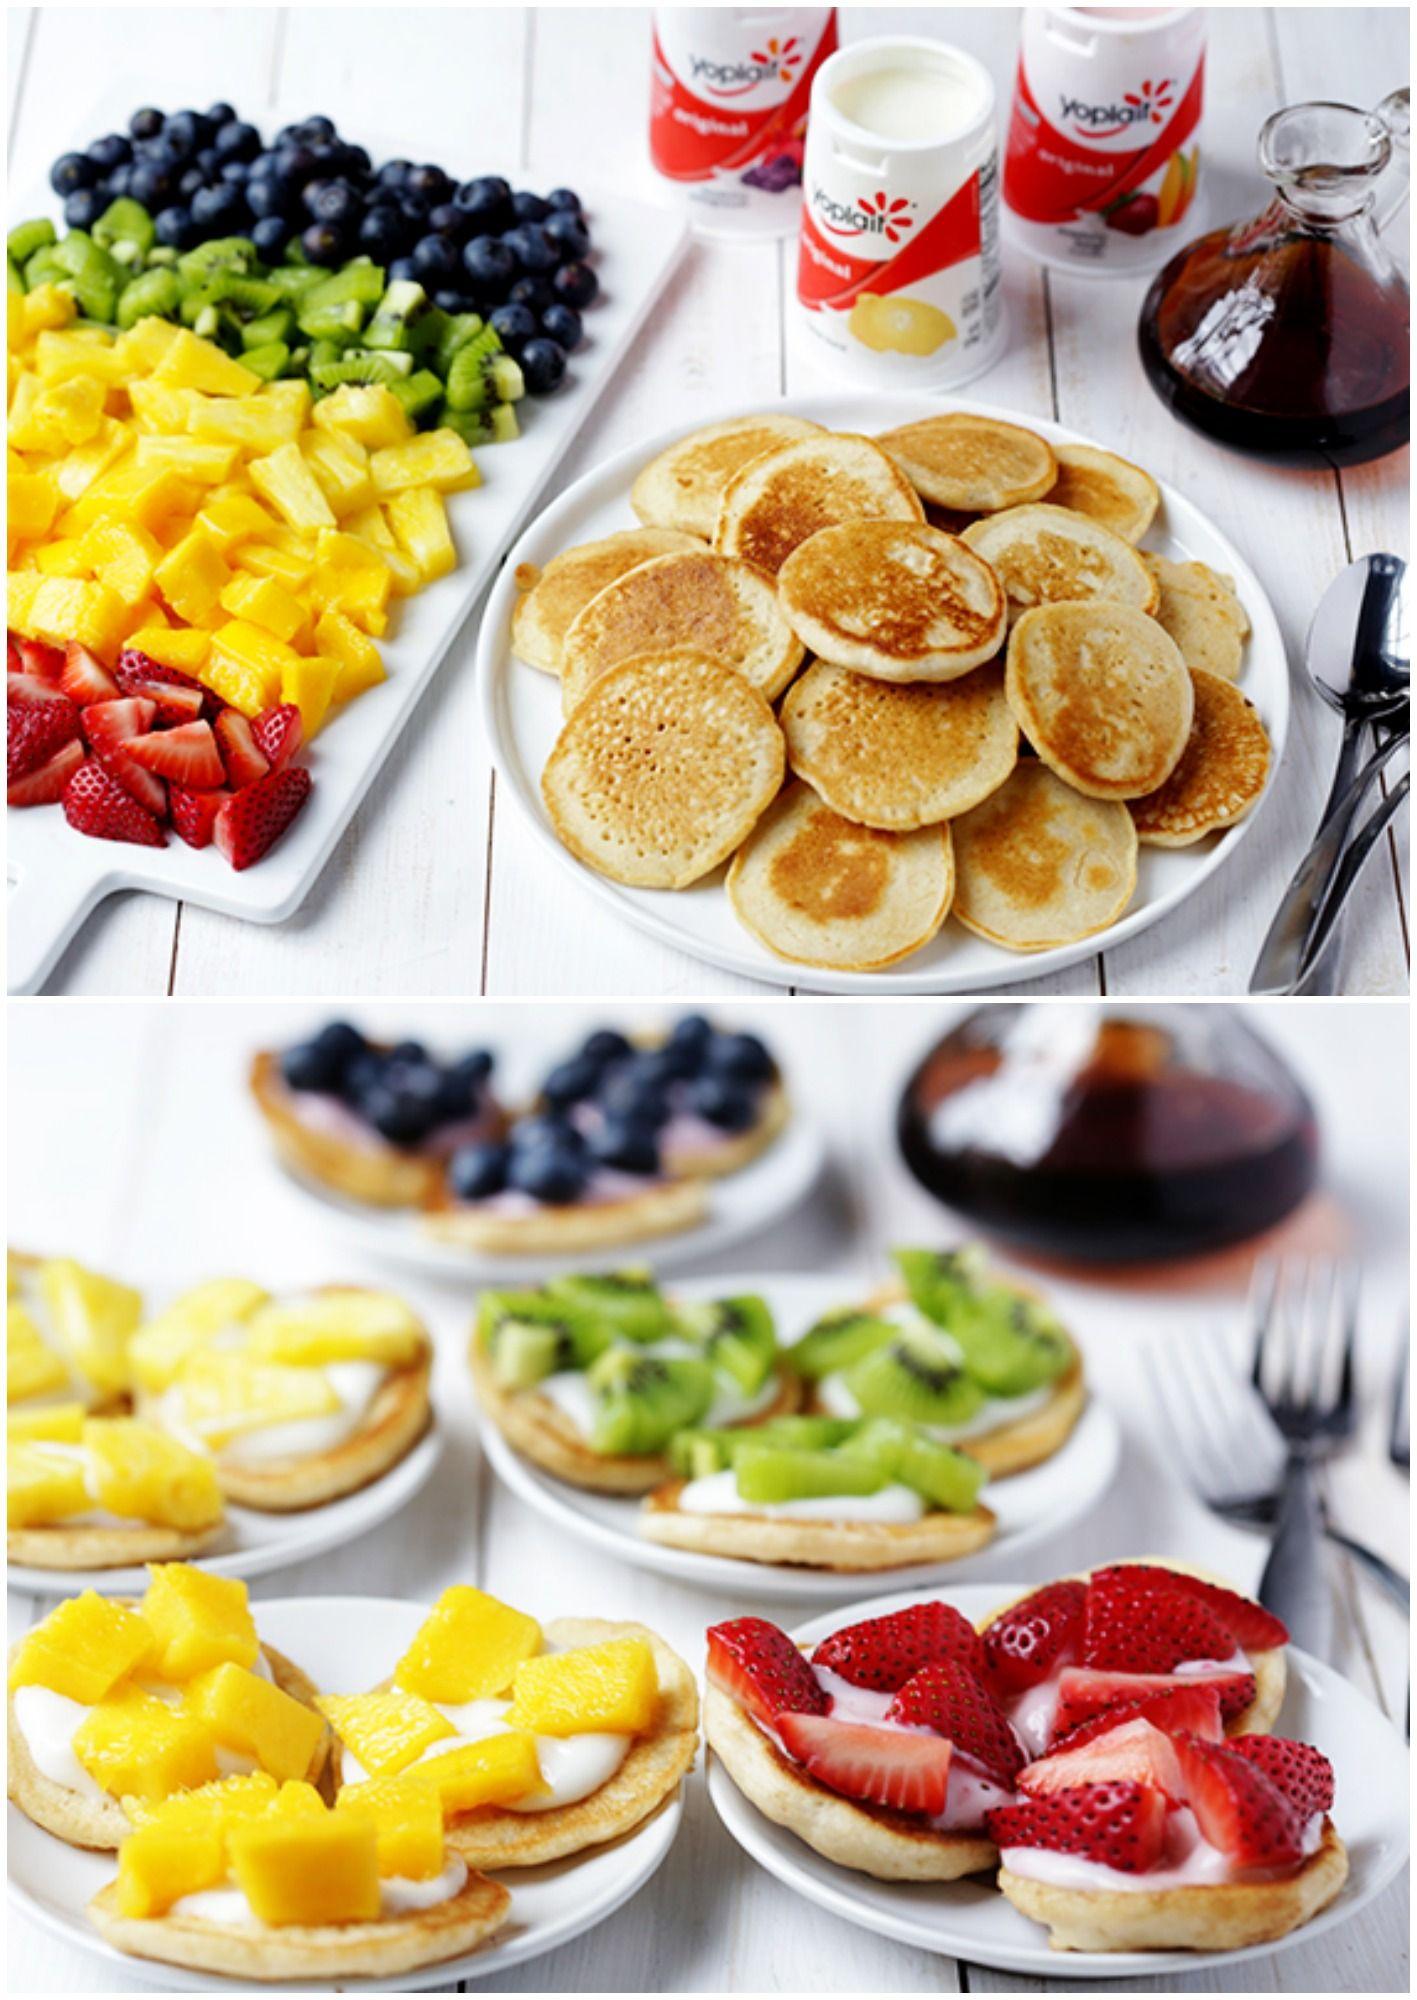 diy mini rainbow pancakes brunch rezept babyparty pinterest brunch fr hst ck und brunch. Black Bedroom Furniture Sets. Home Design Ideas